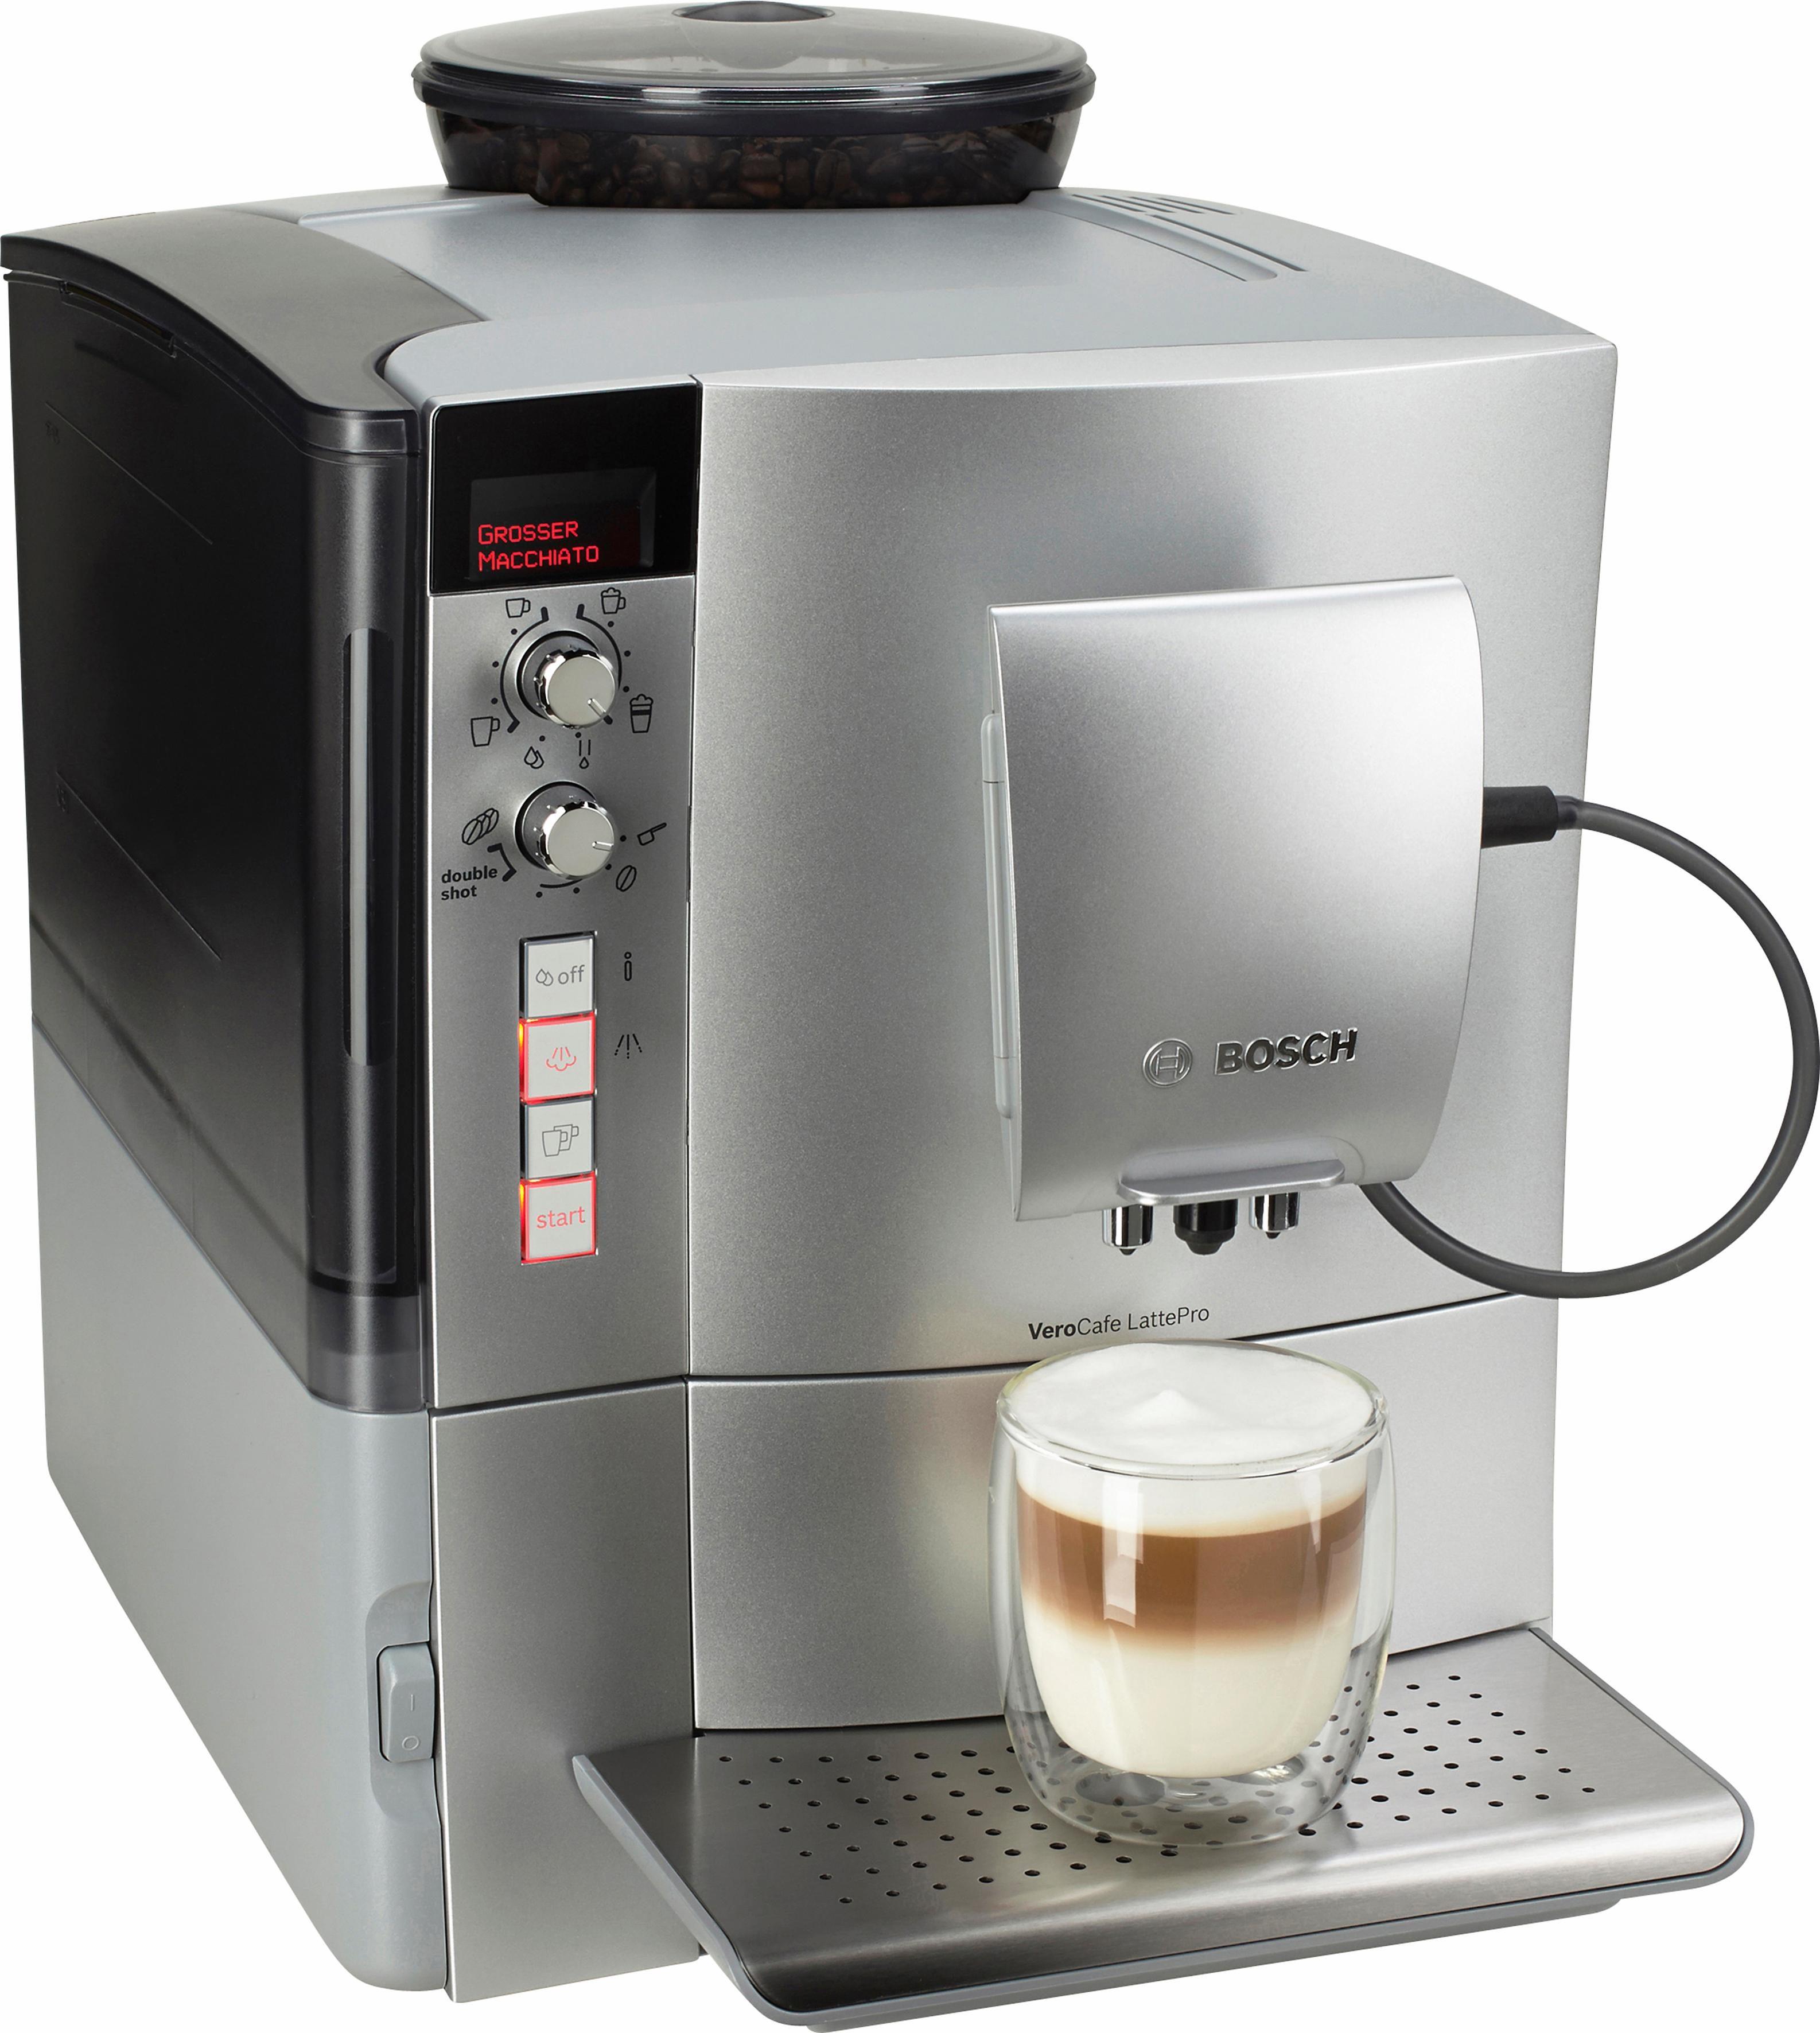 BOSCH Kaffeevollautomat VeroCafe LattePro, 1,7l Tank